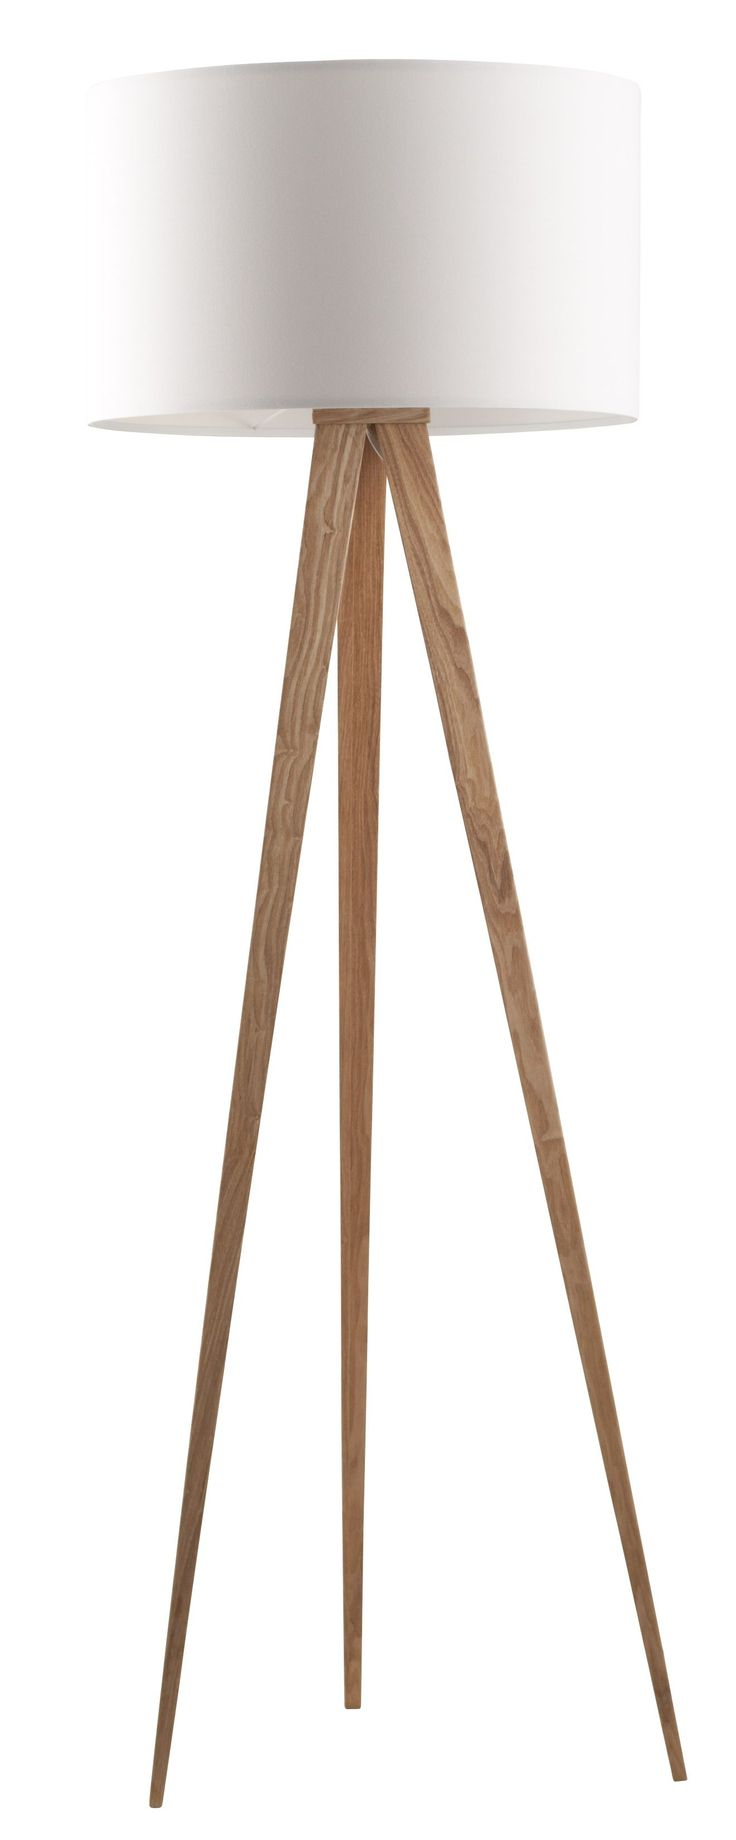 Diy Wood Floor Lamp Best 25 Tripod Lamp Ideas On Pinterest Copper Floor Lamp Diy